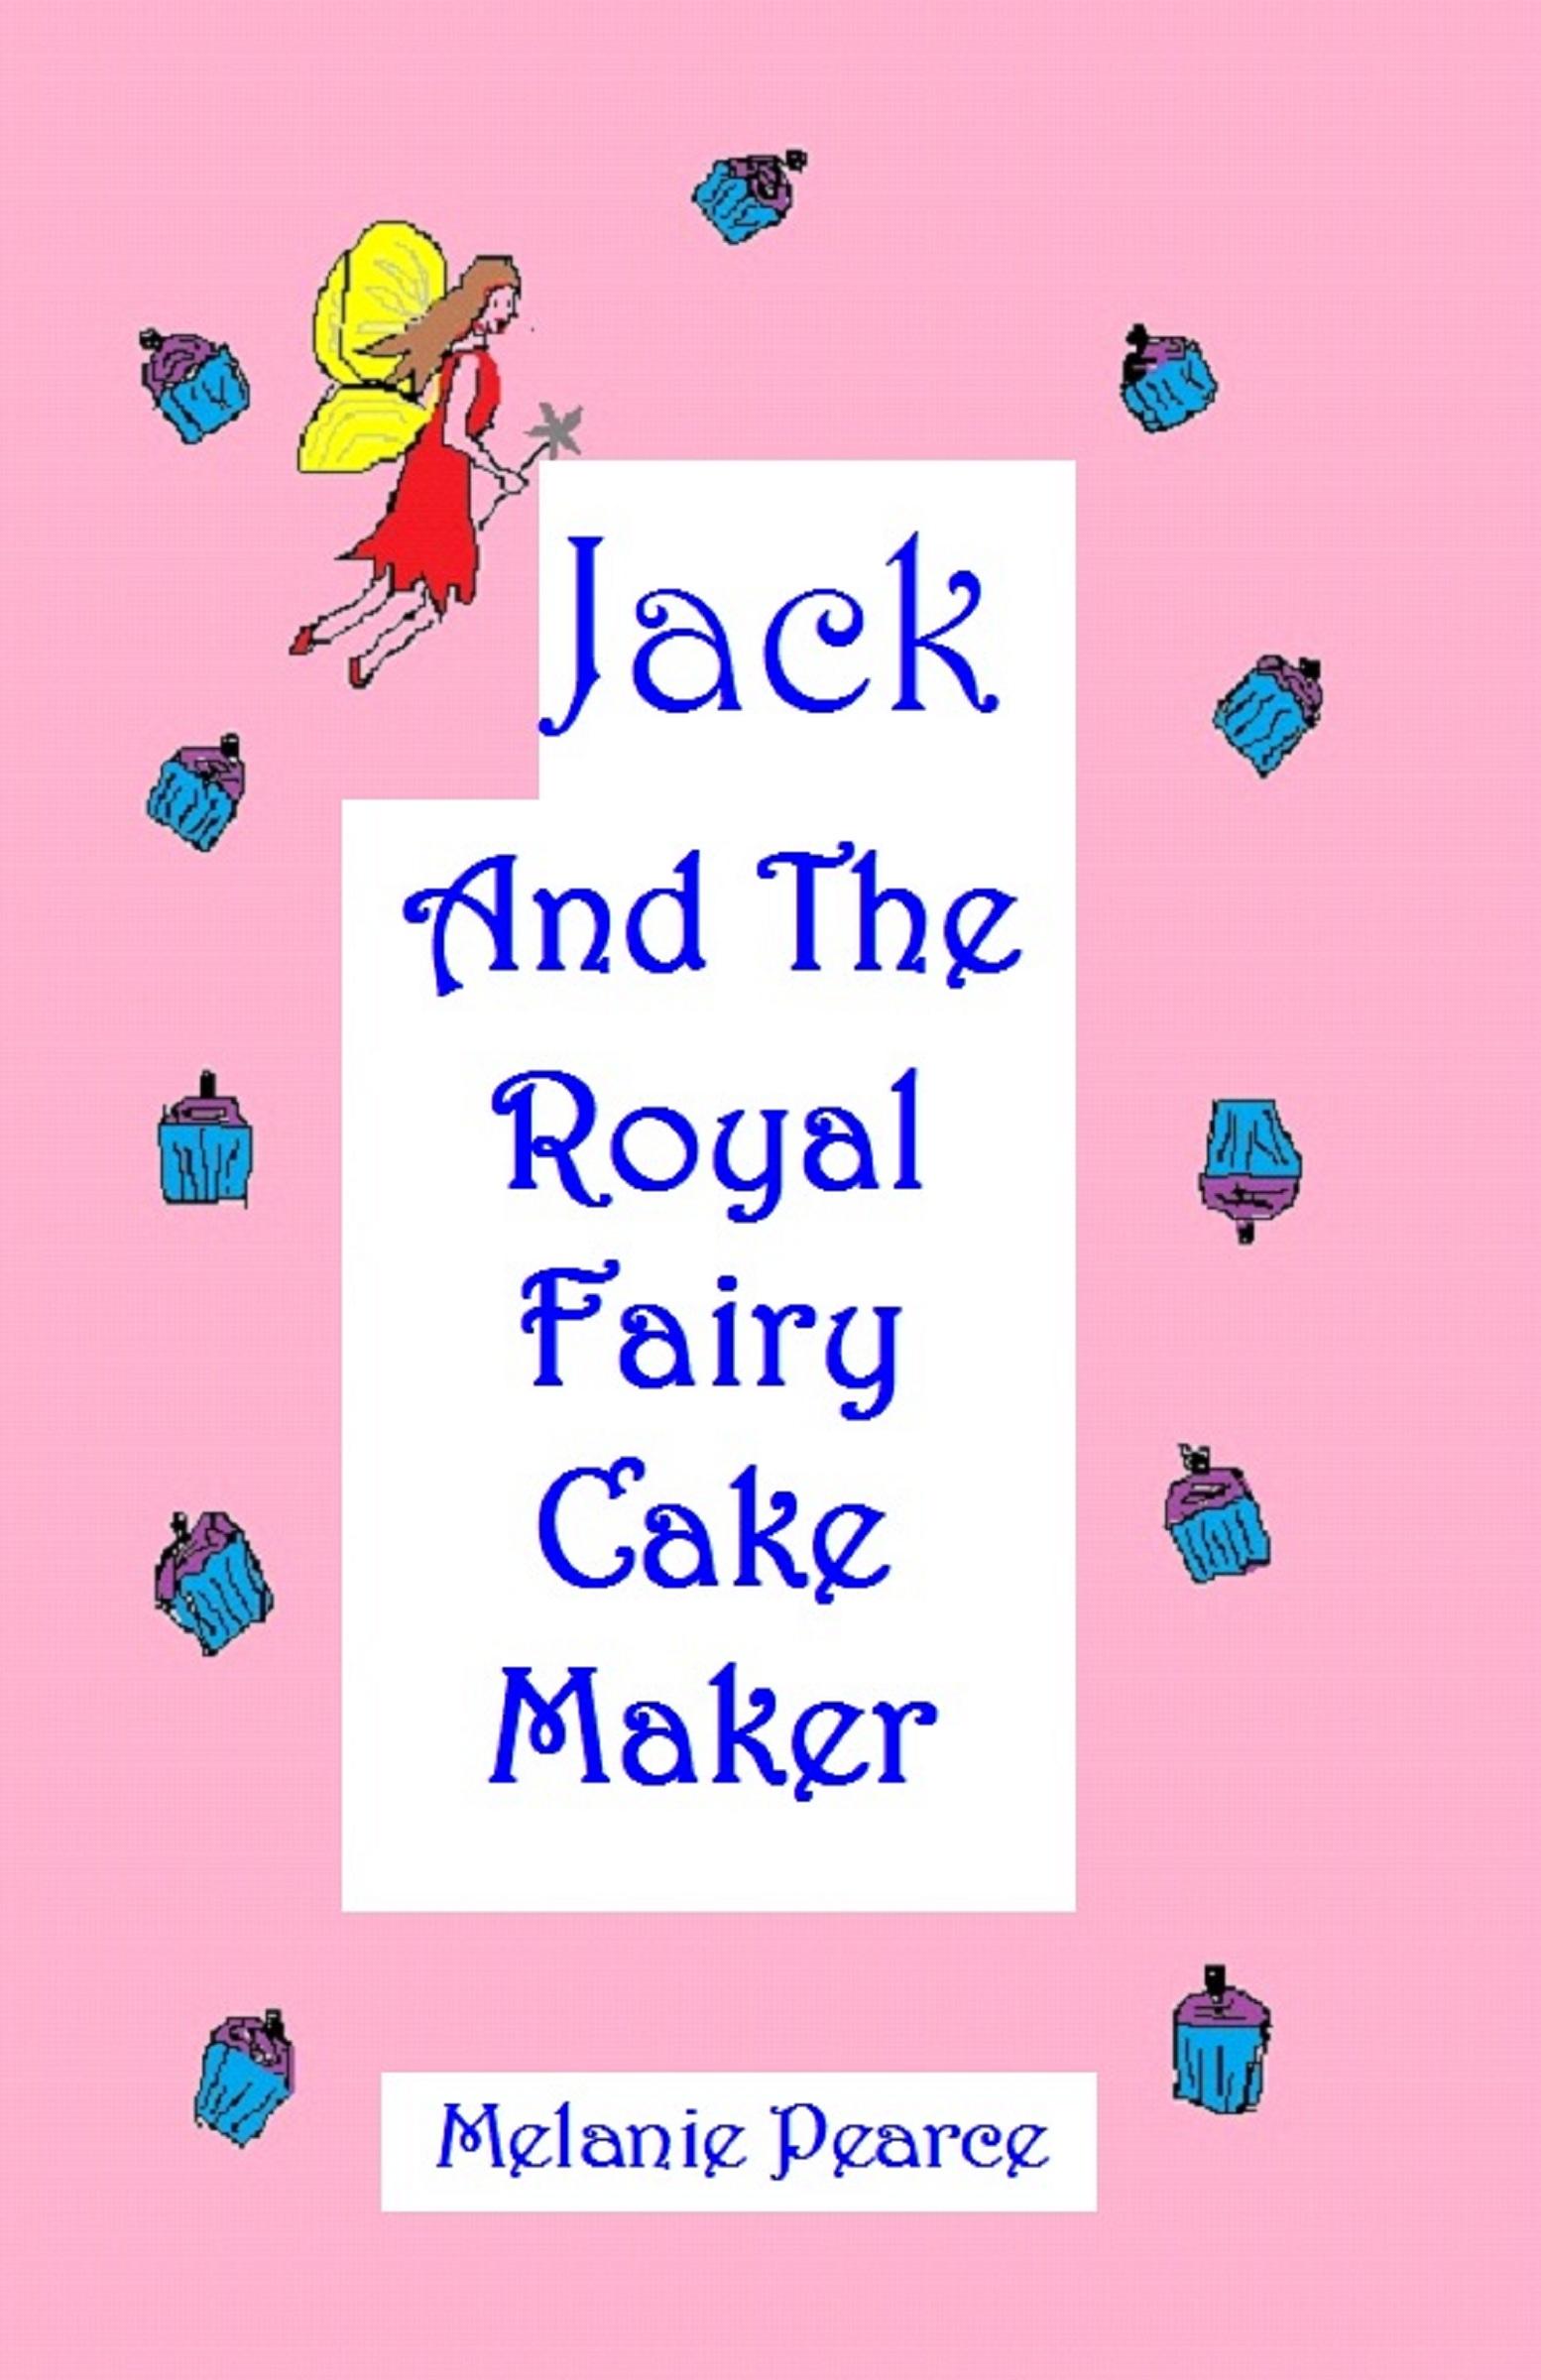 Melanie Pearce - Jack And The Royal Fairy Cake Maker